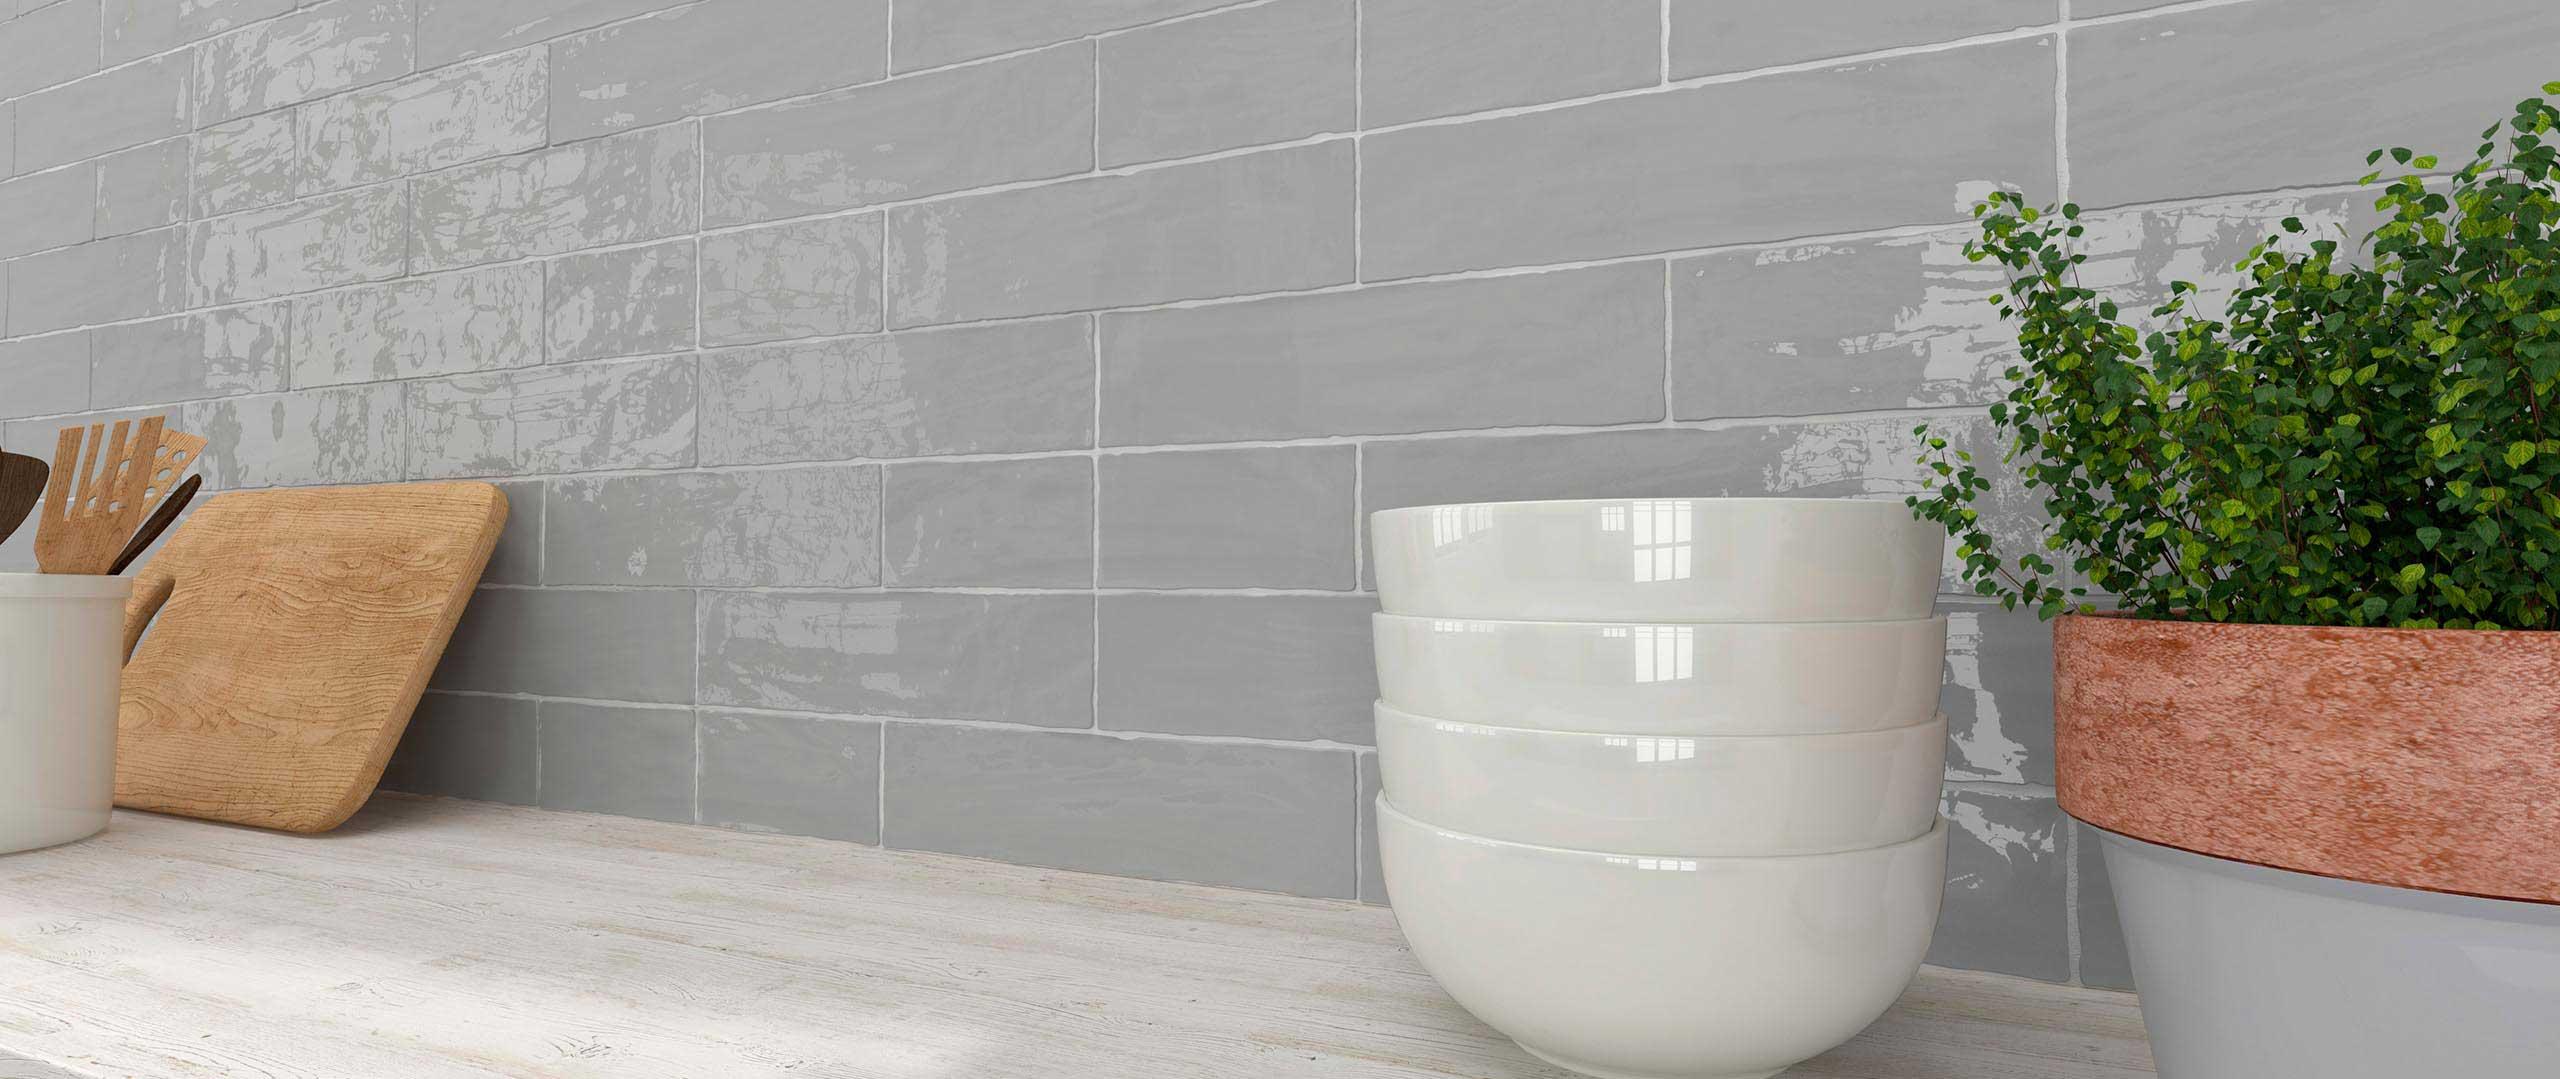 A custom natural cut on a smoky high gloss gray subway tile. Available at Custom Home Interiors